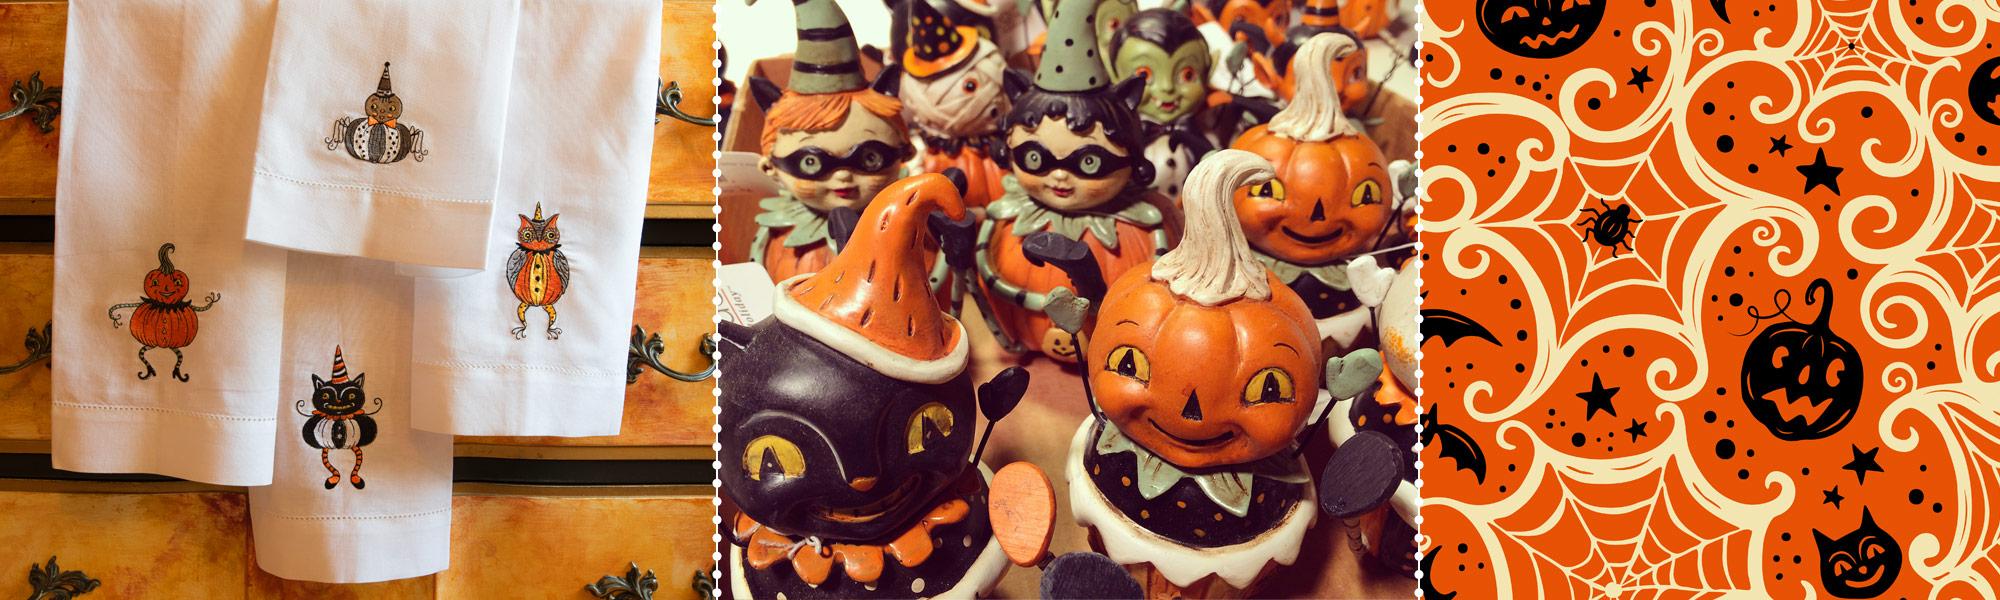 Resource-Guide-Halloween-Banner4.jpg